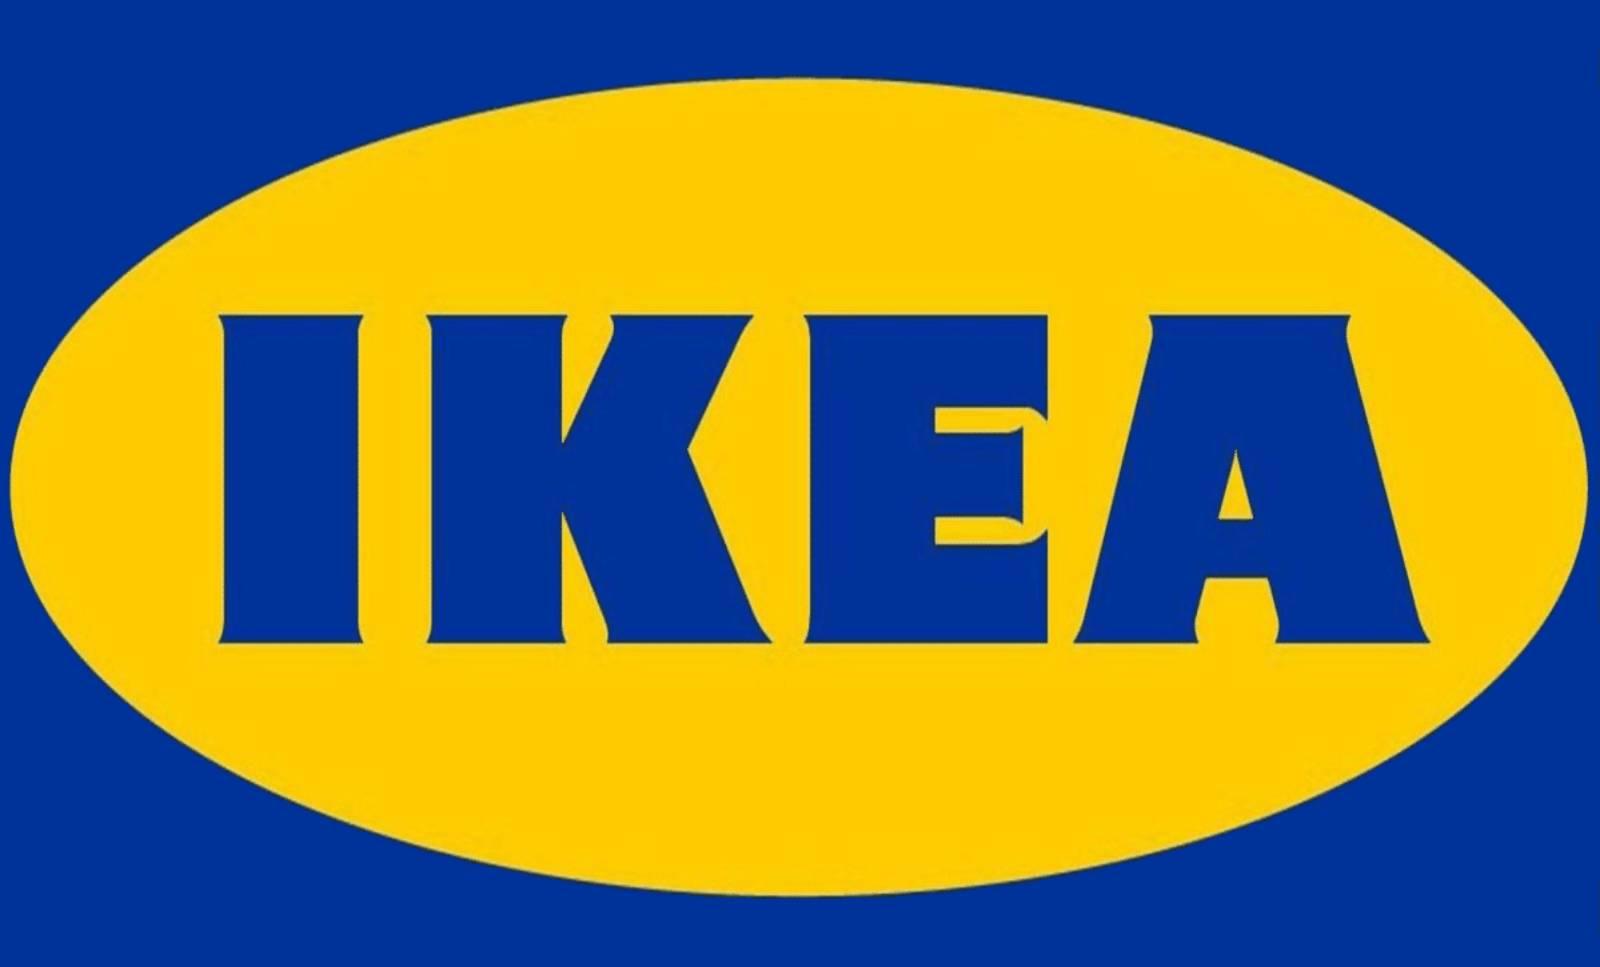 Ikea reduceri google maps dubai